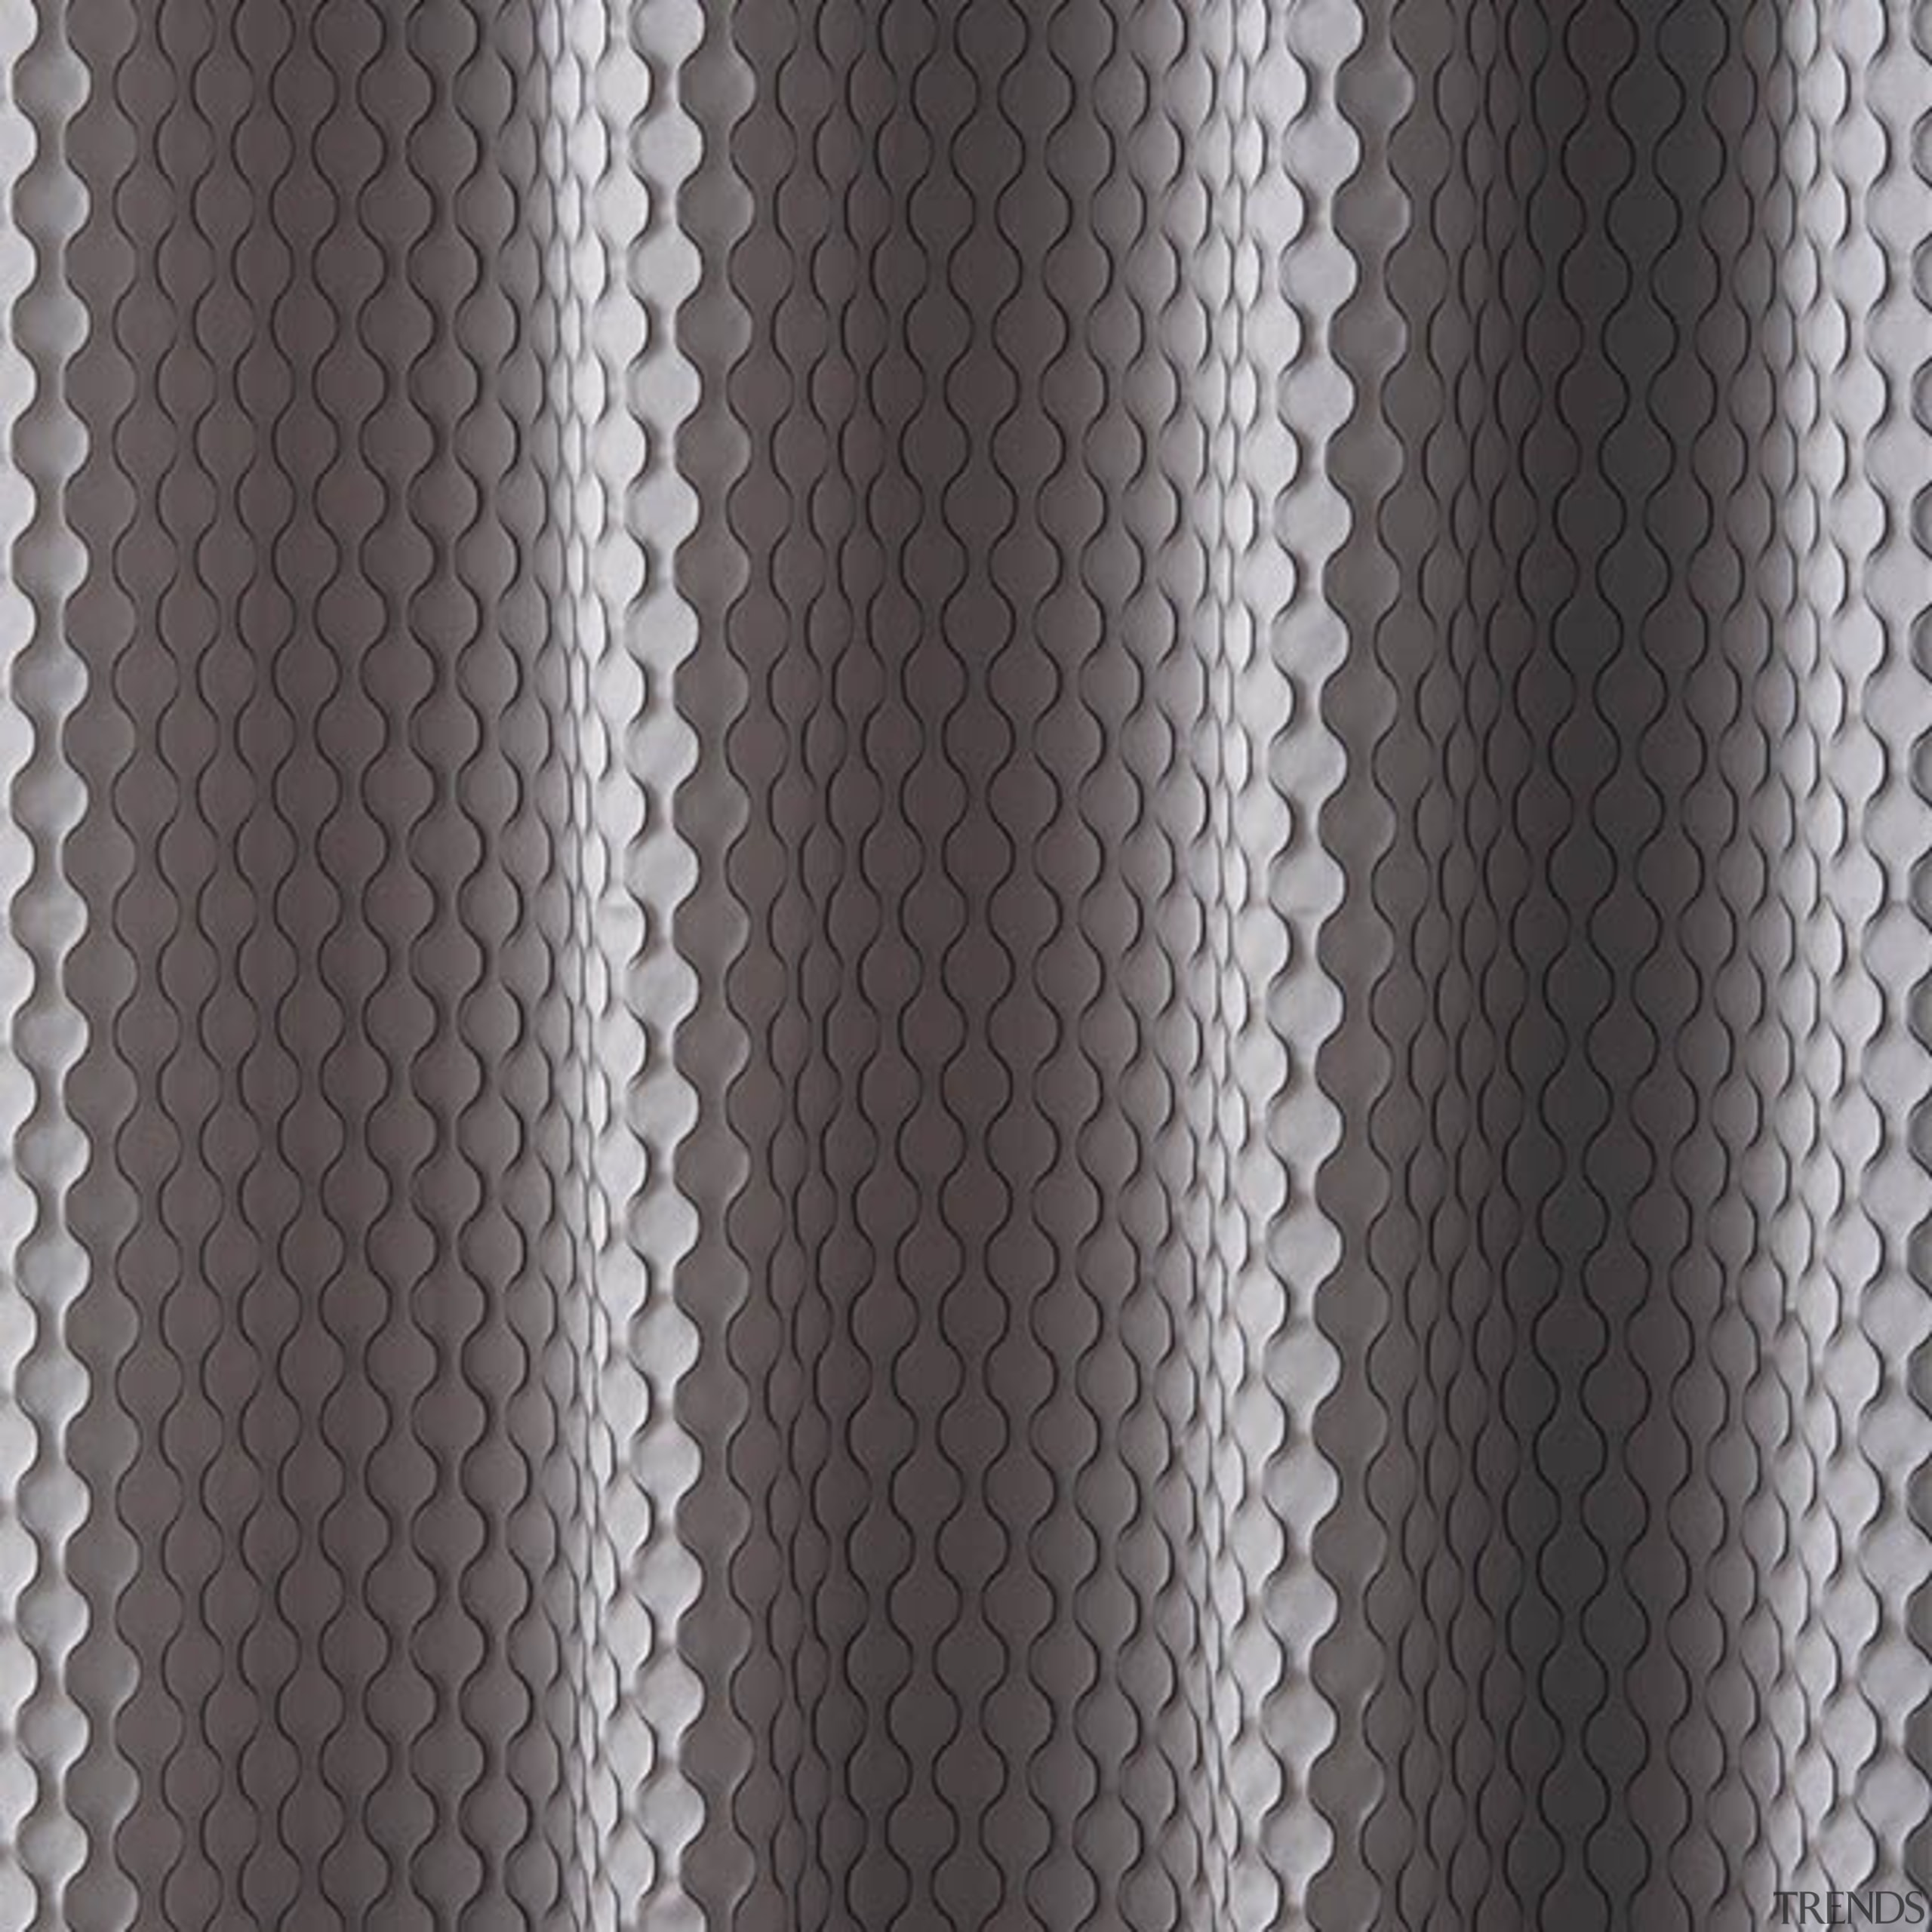 Tempest 4 - angle   black   black angle, black, black and white, design, line, material, mesh, monochrome, monochrome photography, pattern, texture, gray, black